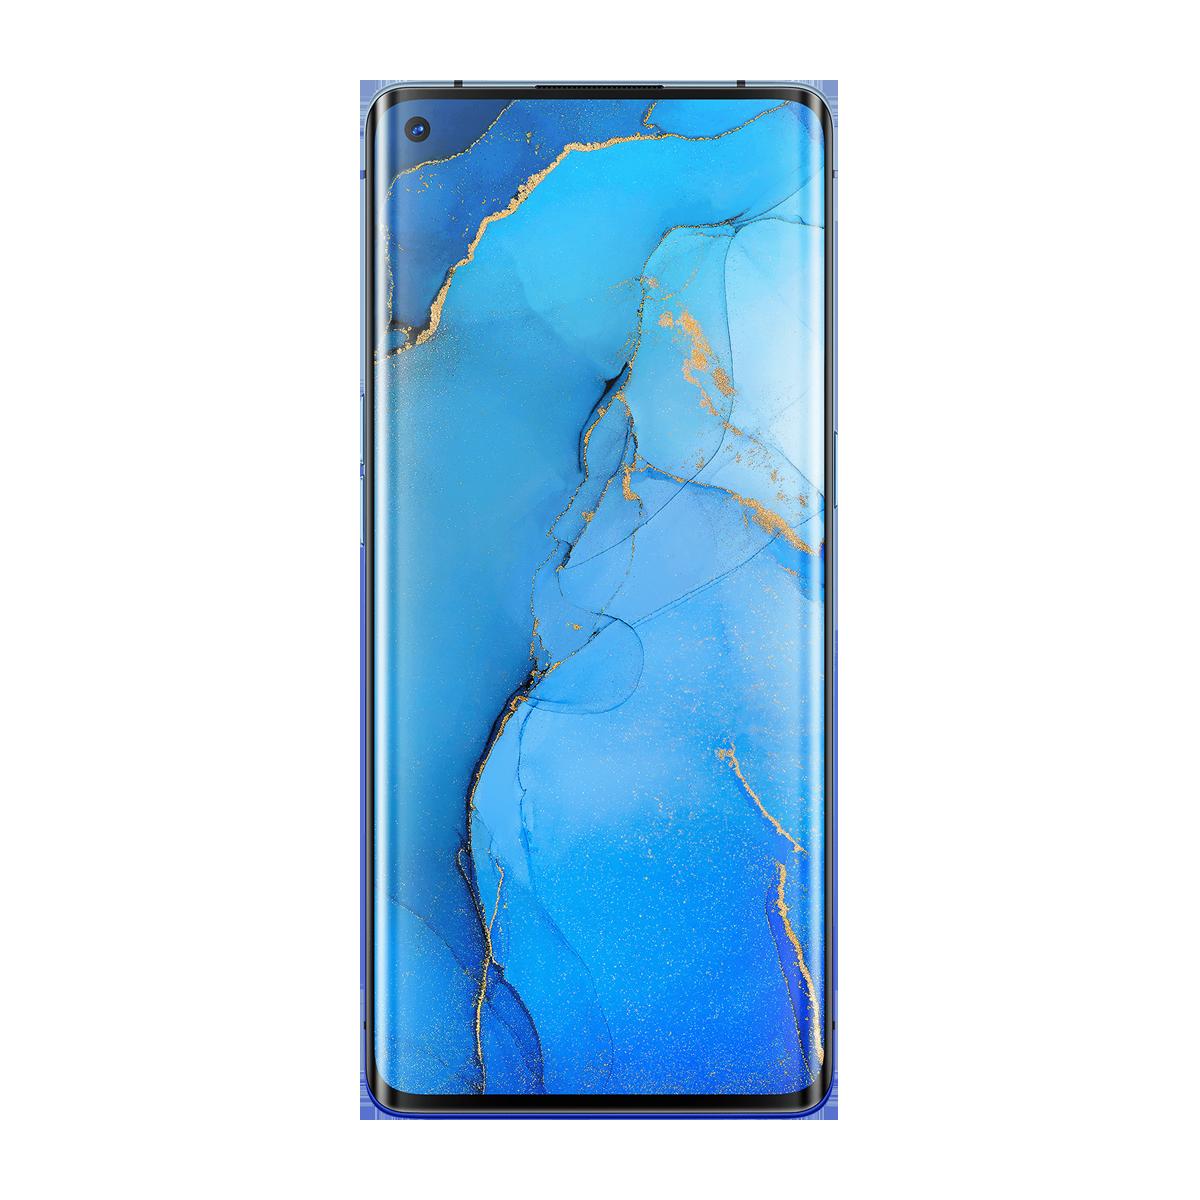 Oppo Reno 3 Pro 256 GB Mavi